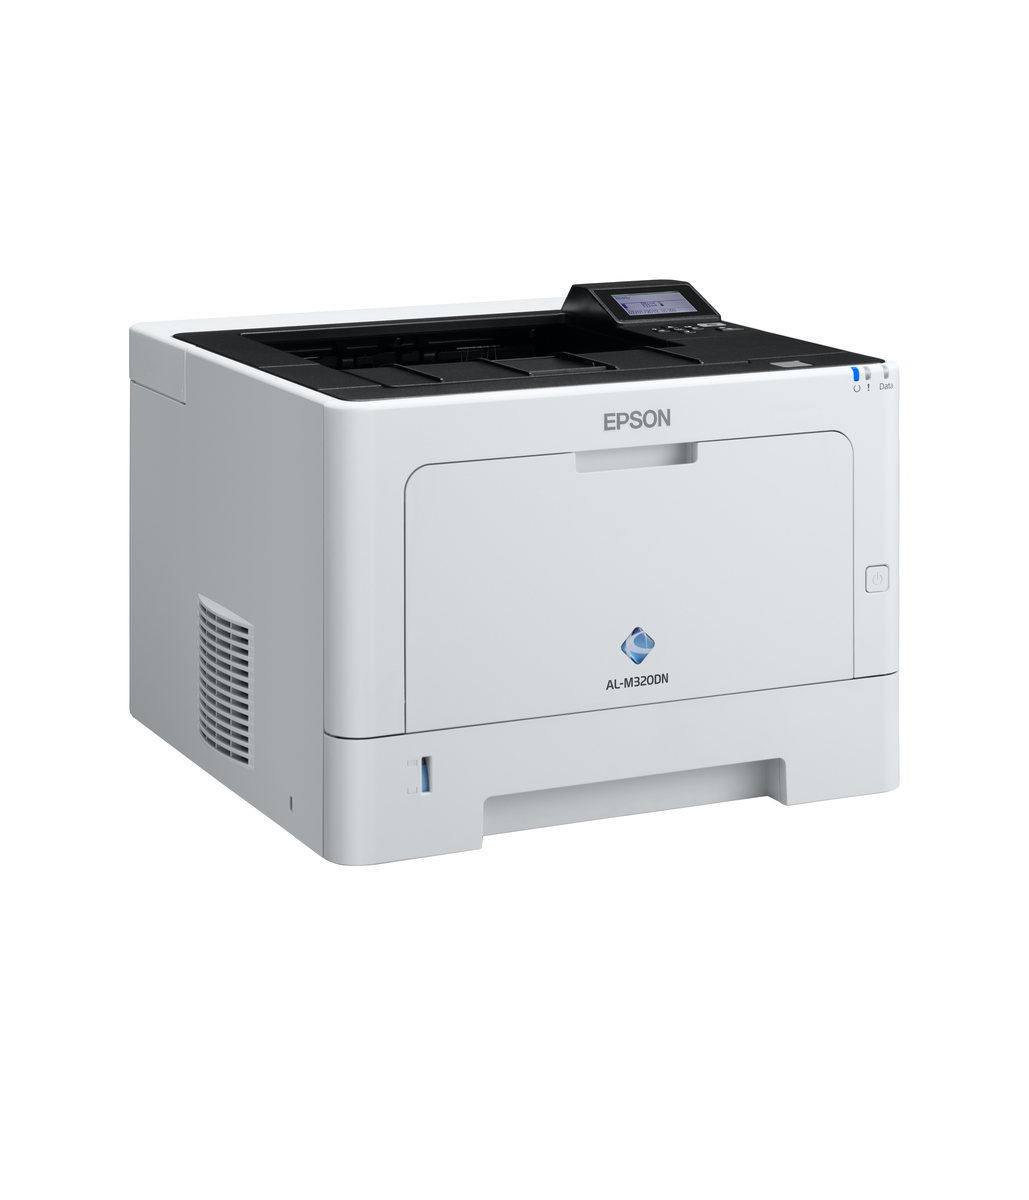 Epson WorkForce AL-M320DN 40ppm, Lan, Duplex